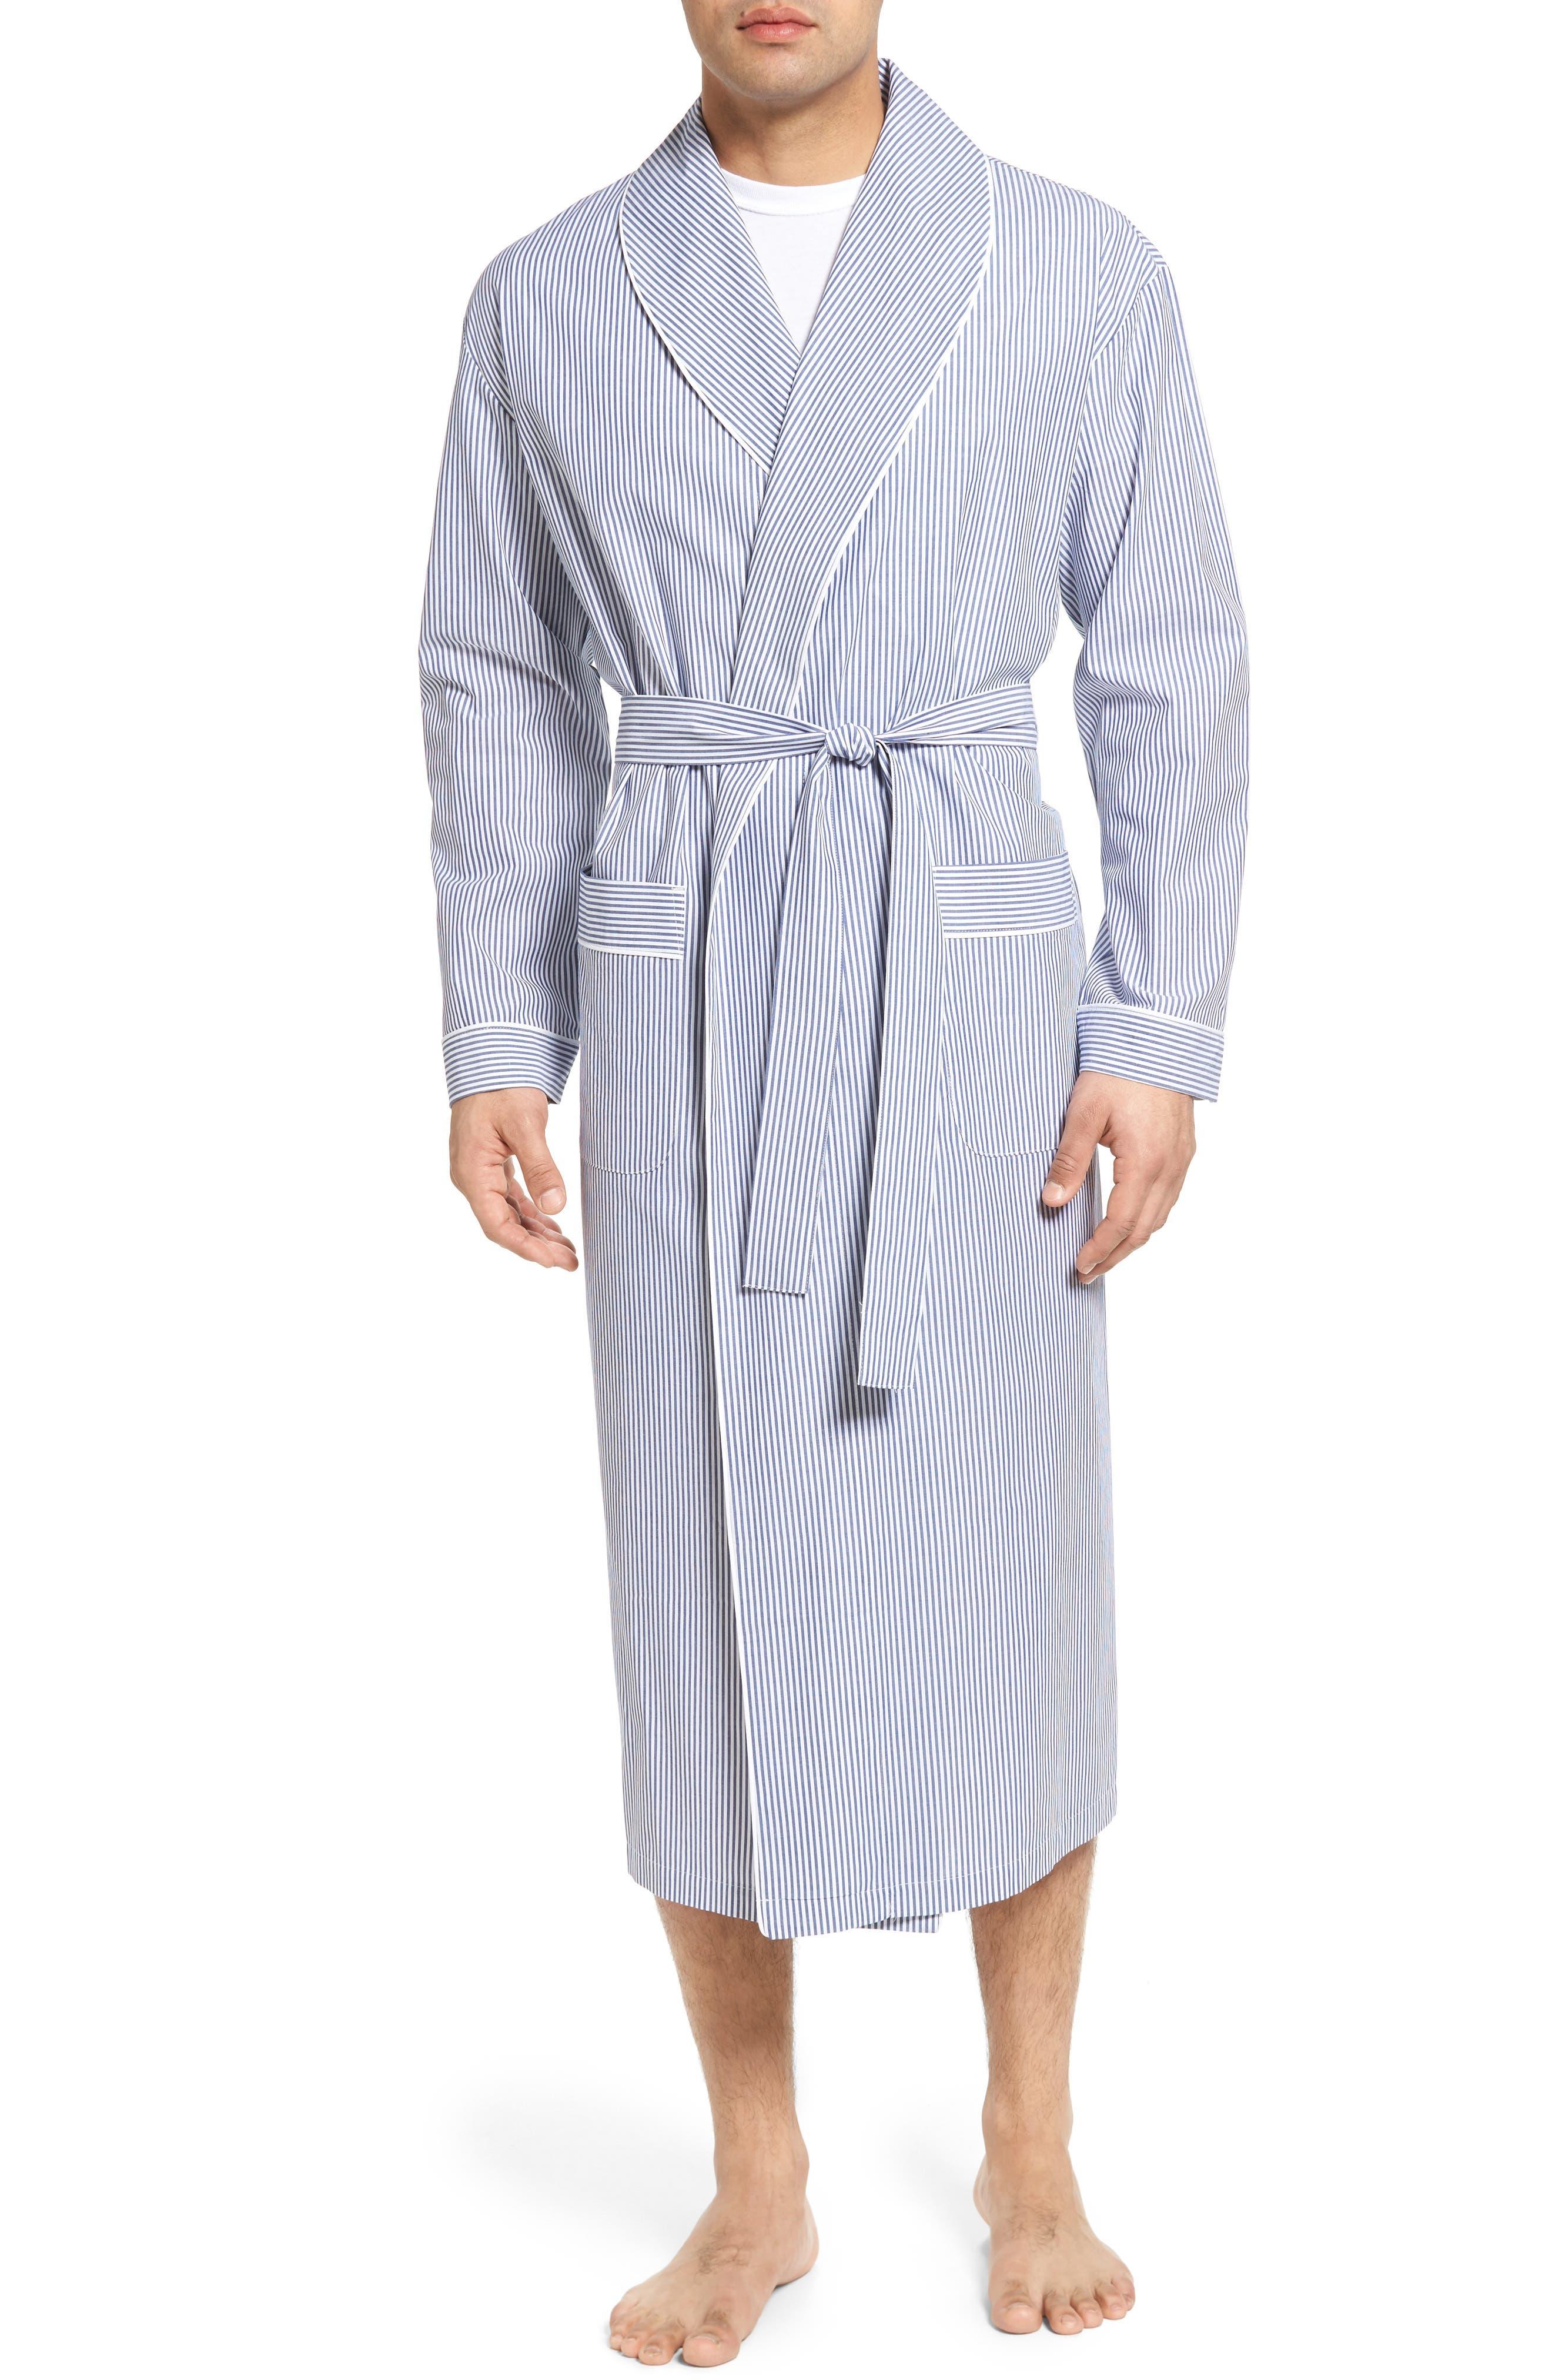 Bengal Stripe Robe,                             Main thumbnail 1, color,                             NAVY/ WHITE